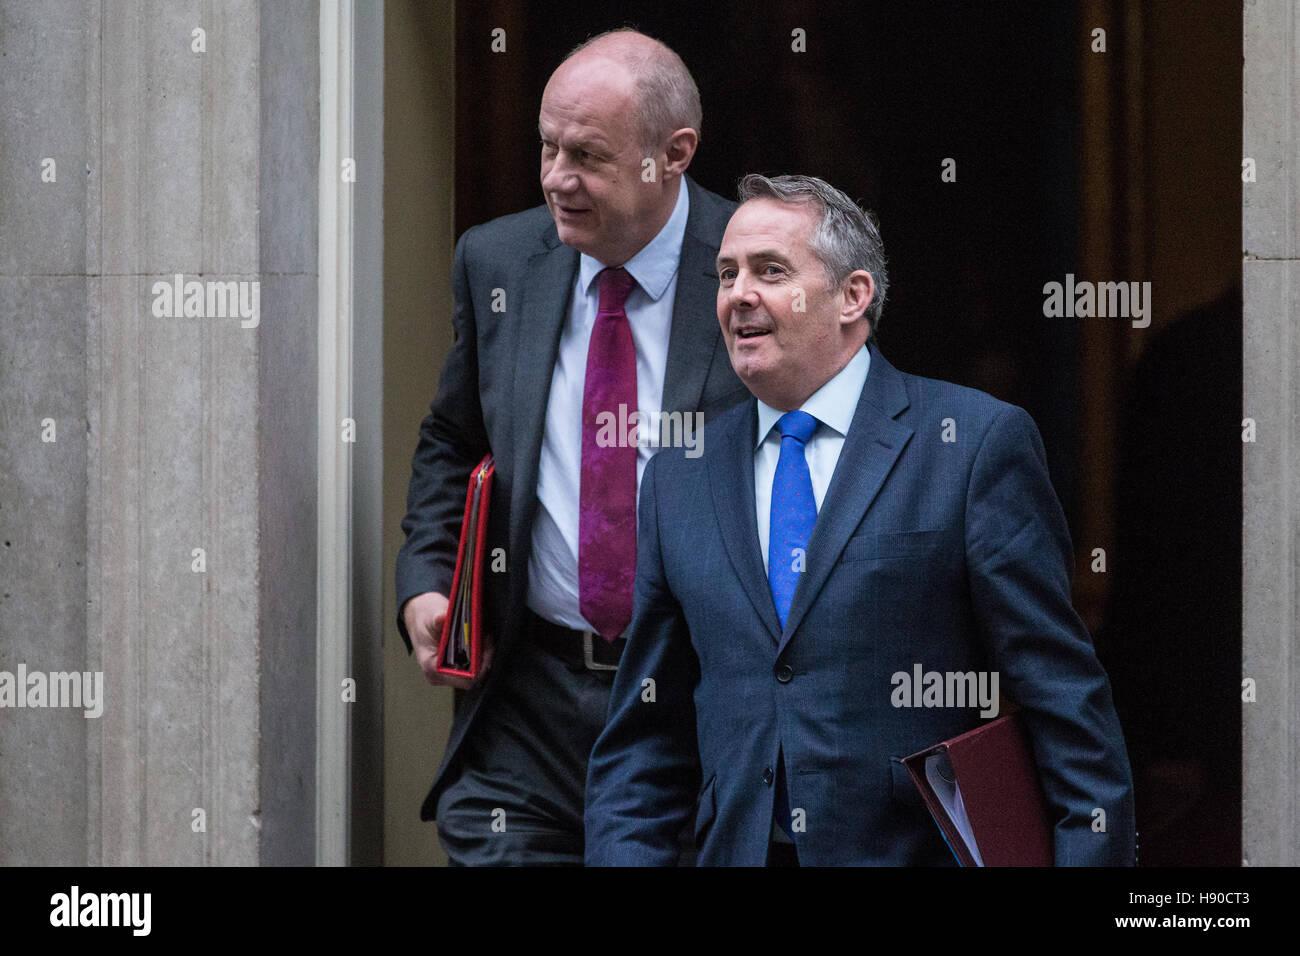 London, UK. 10th January, 2017. Liam Fox MP, Secretary of State for International Trade, and Damian Green MP, Secretary - Stock Image